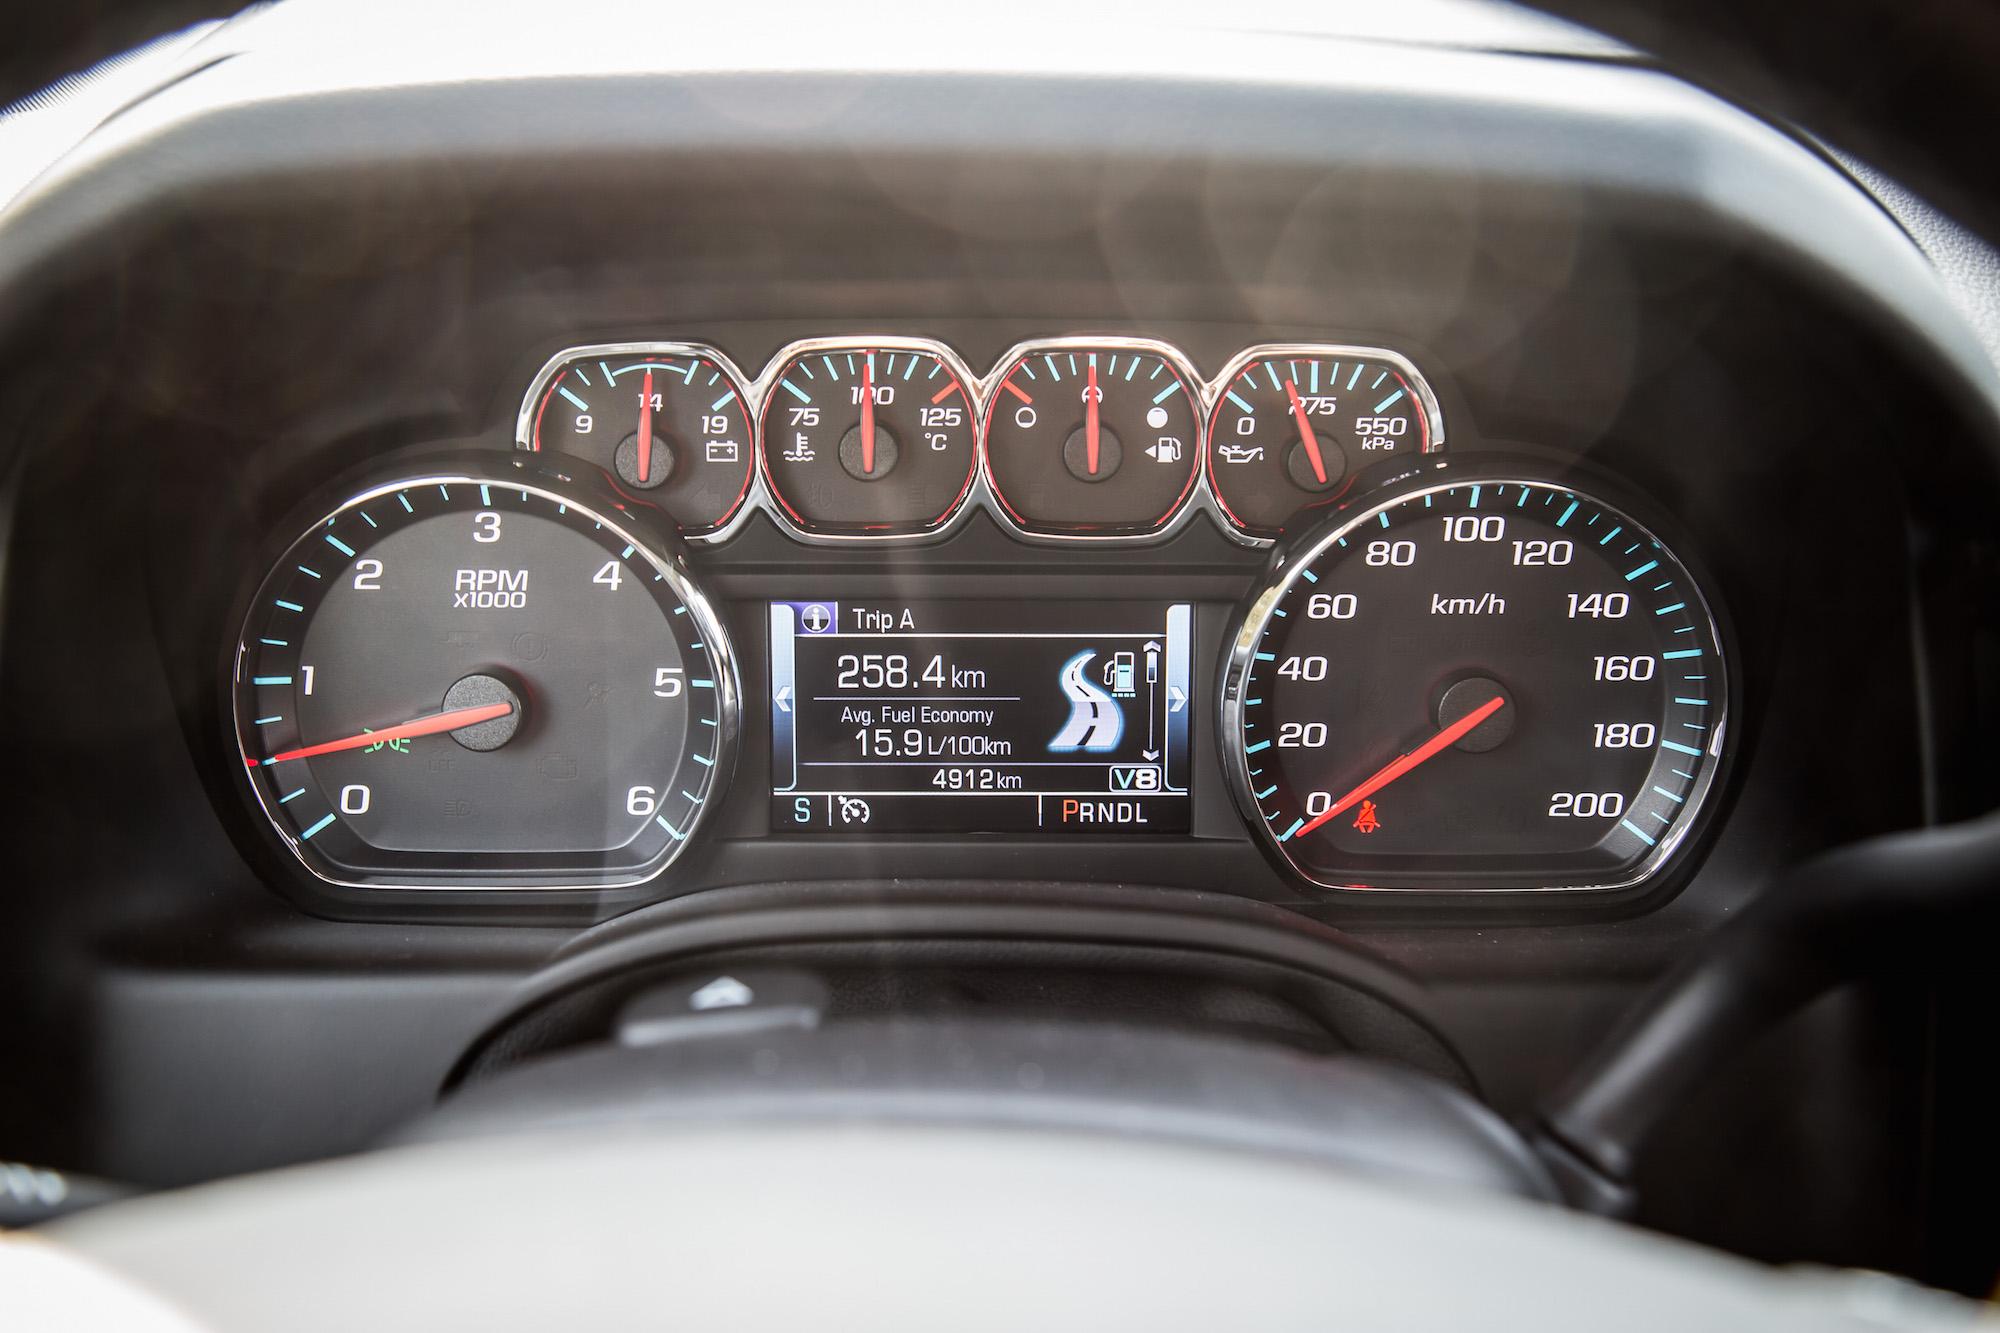 Tahoe Rst Gauges on Cadillac 4100 Engine Upgrades